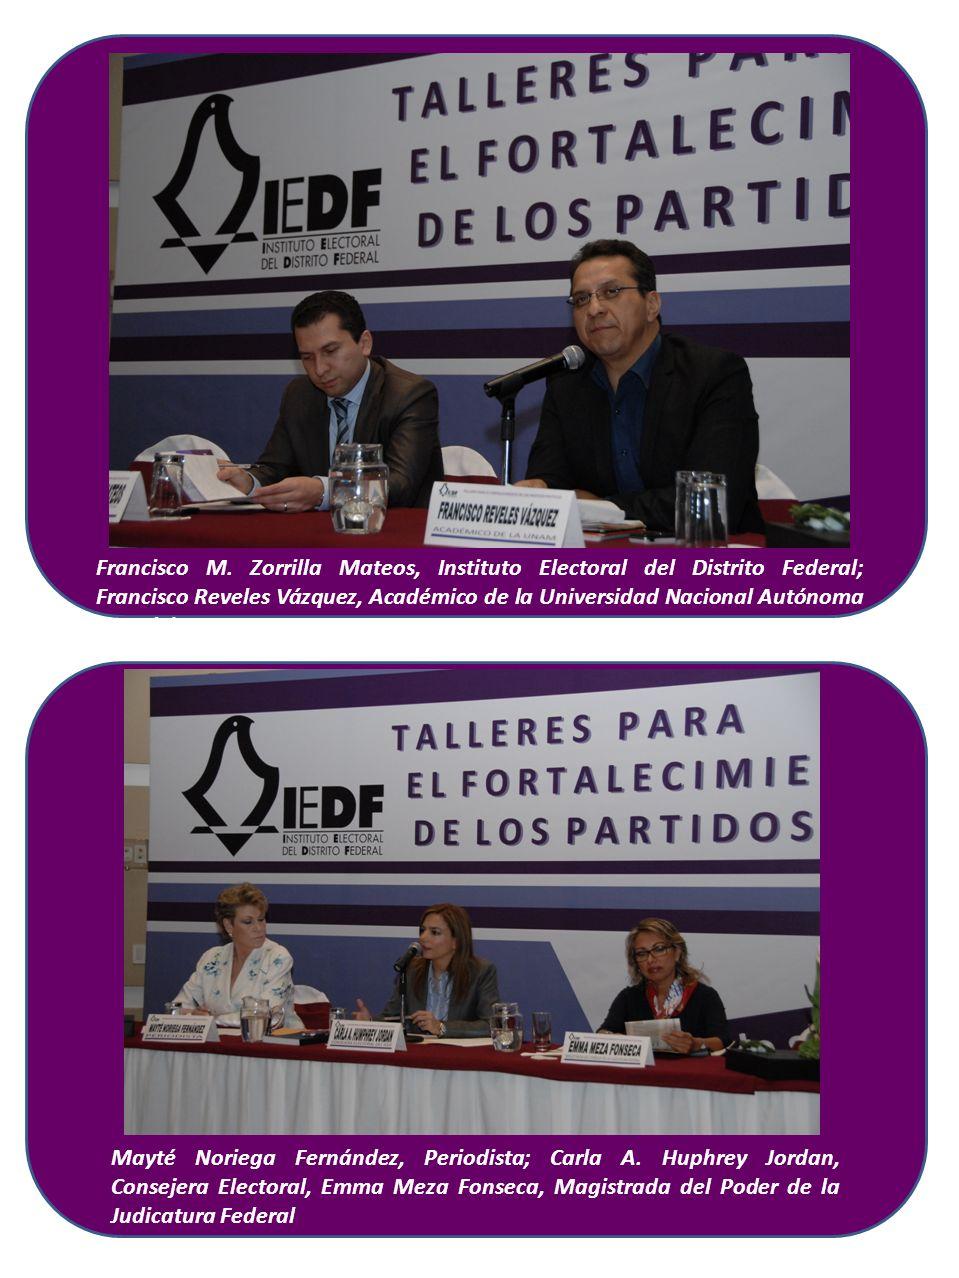 Francisco M. Zorrilla Mateos, Instituto Electoral del Distrito Federal; Francisco Reveles Vázquez, Académico de la Universidad Nacional Autónoma de Mé